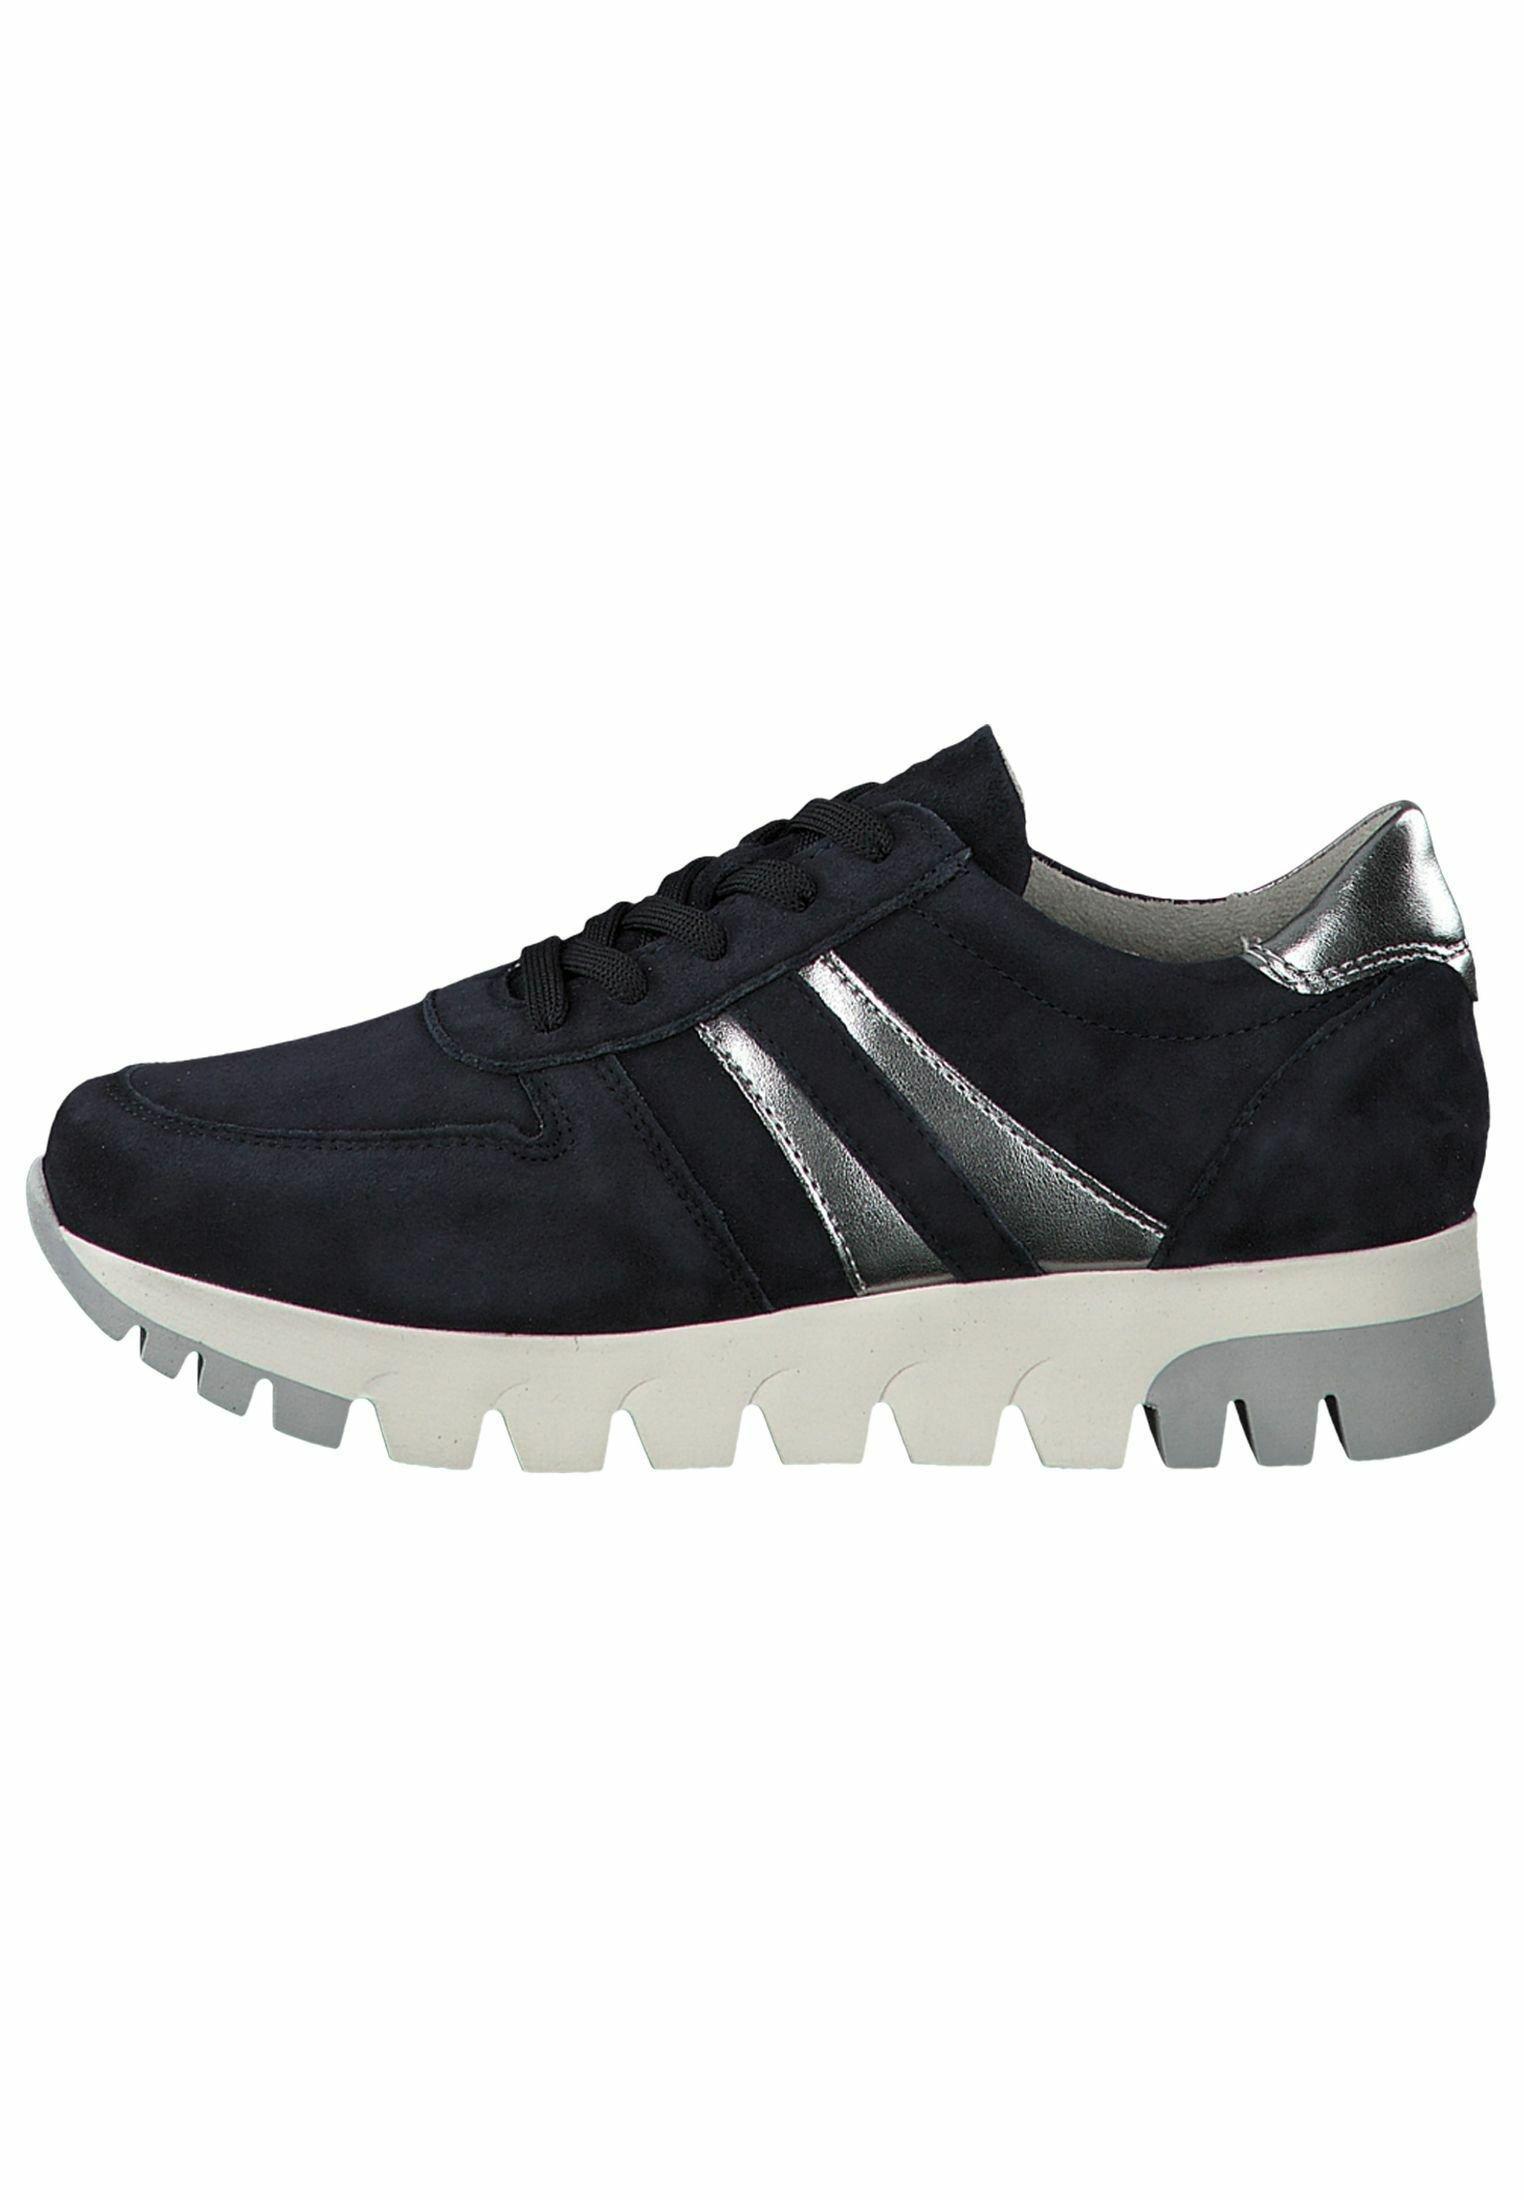 Tamaris Lace Up - Sneaker Low Cognac/croco/braun